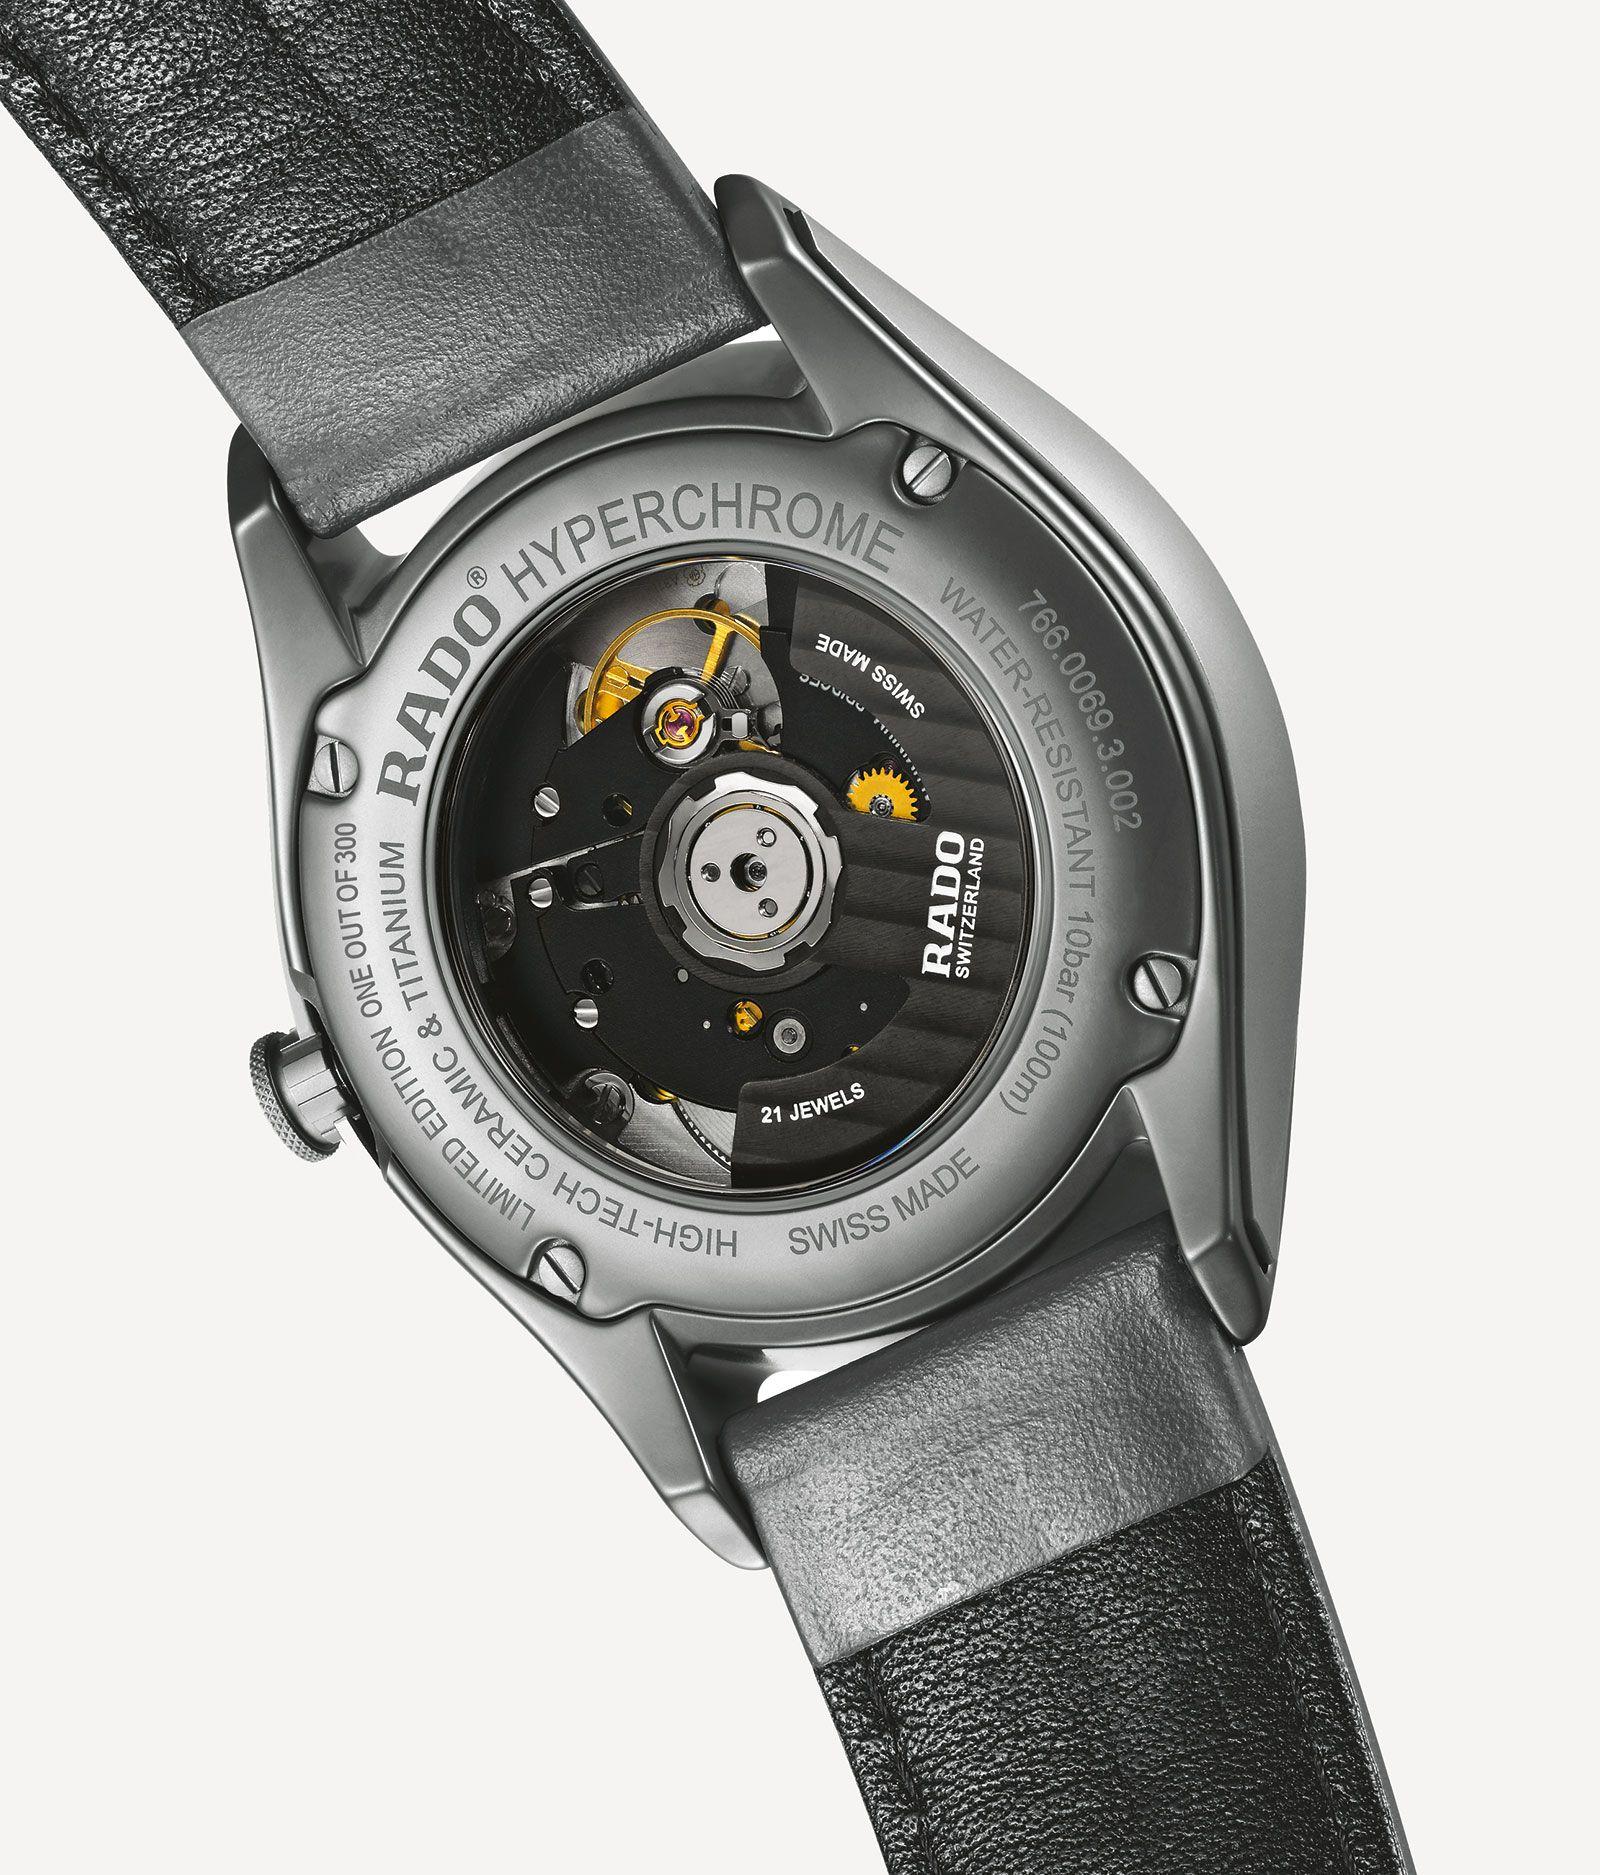 595c8dd1e rado-hyperchrome-ultra-light-caseback-perpetuelle | Wrist Style ...